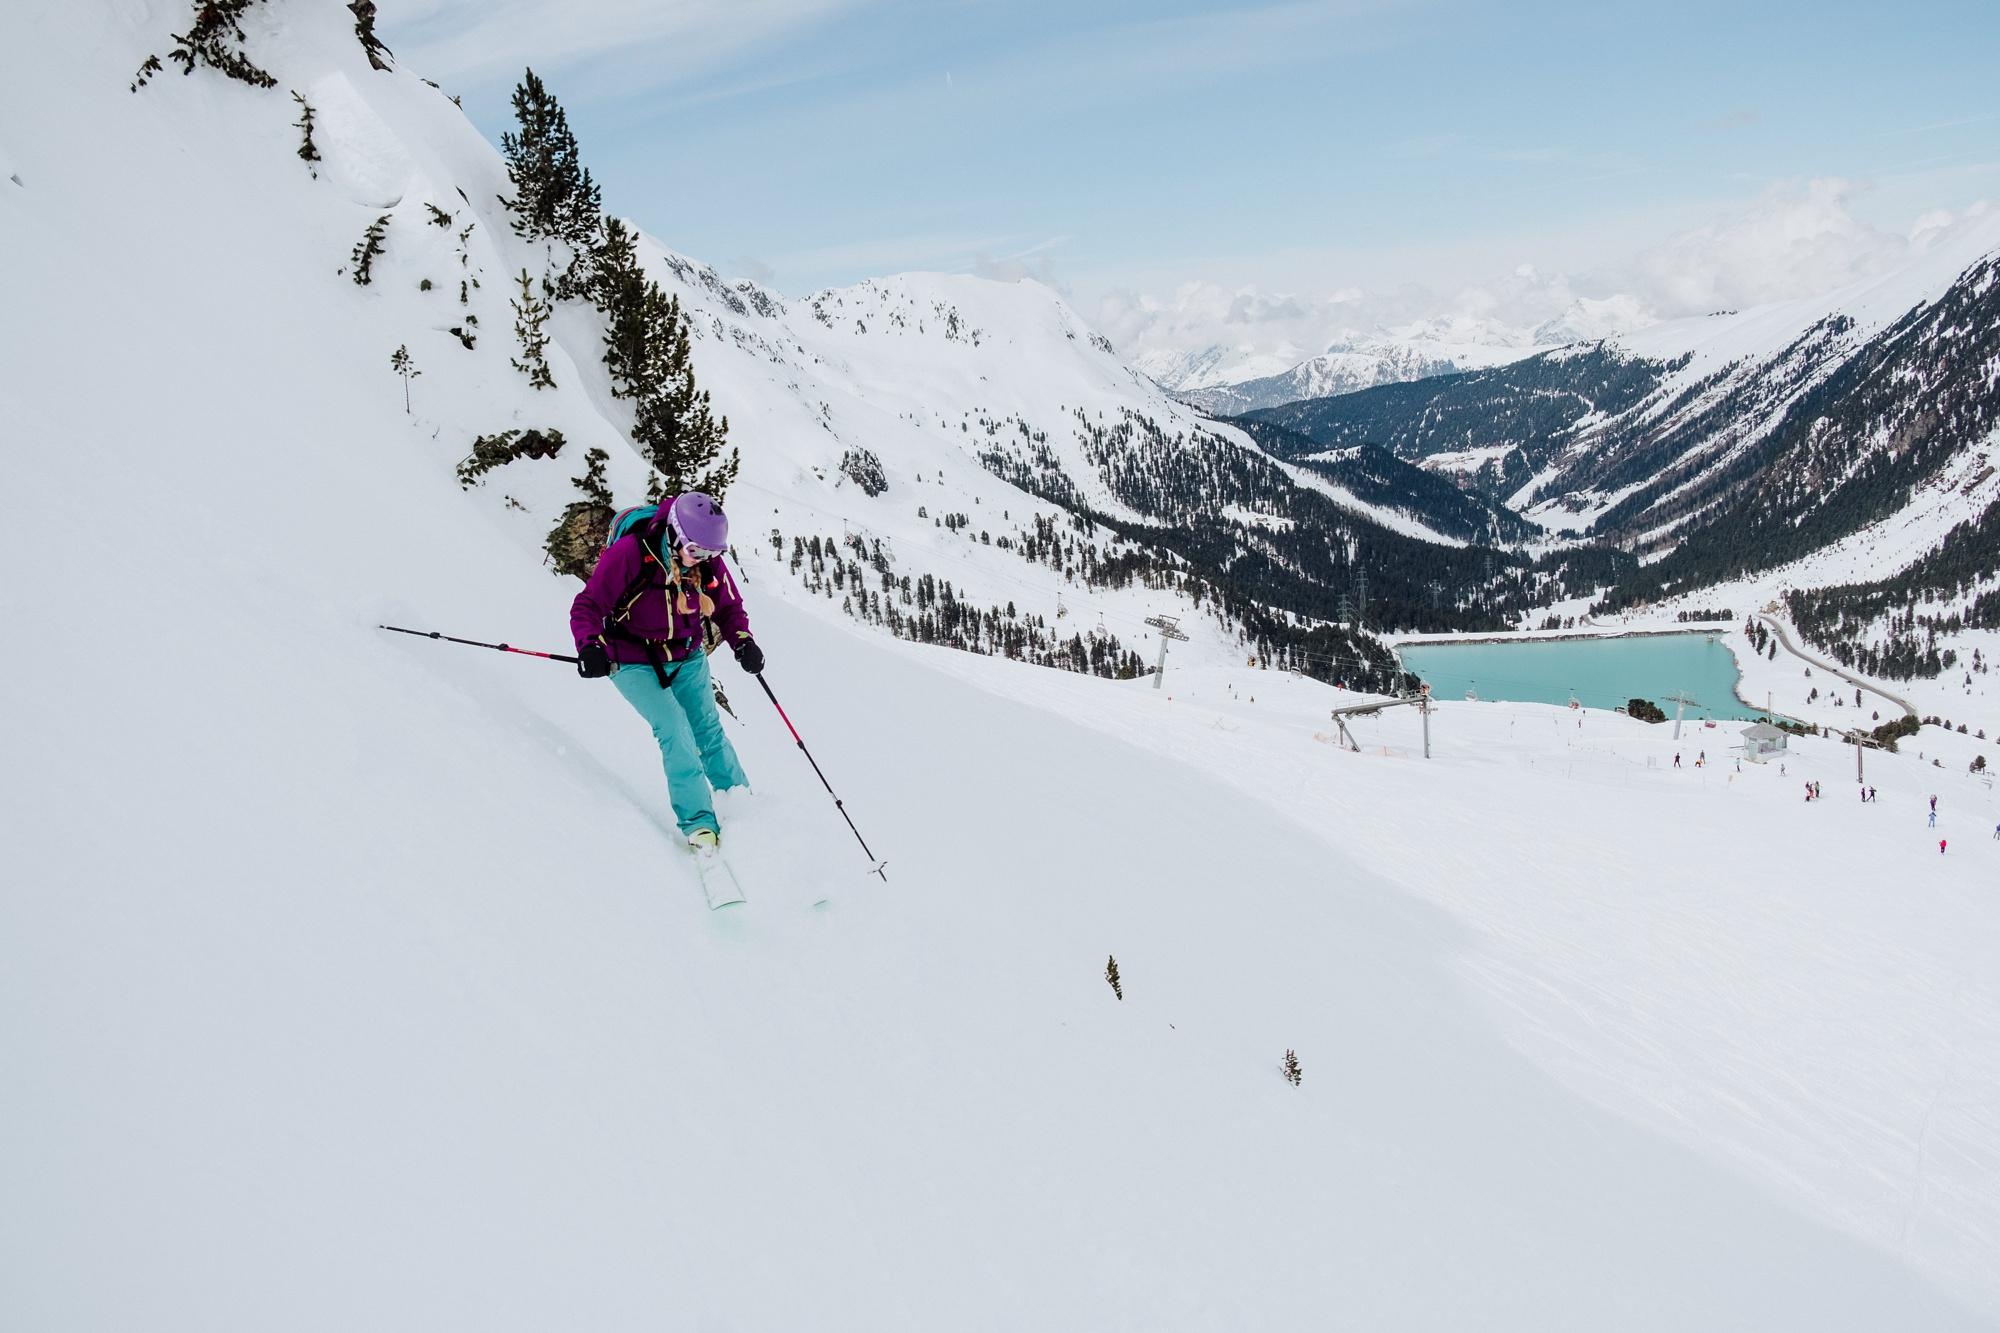 Cat Ekkelboom-White Off-piste skiing in Kuhtai in Austria by Menno Ekkelboom